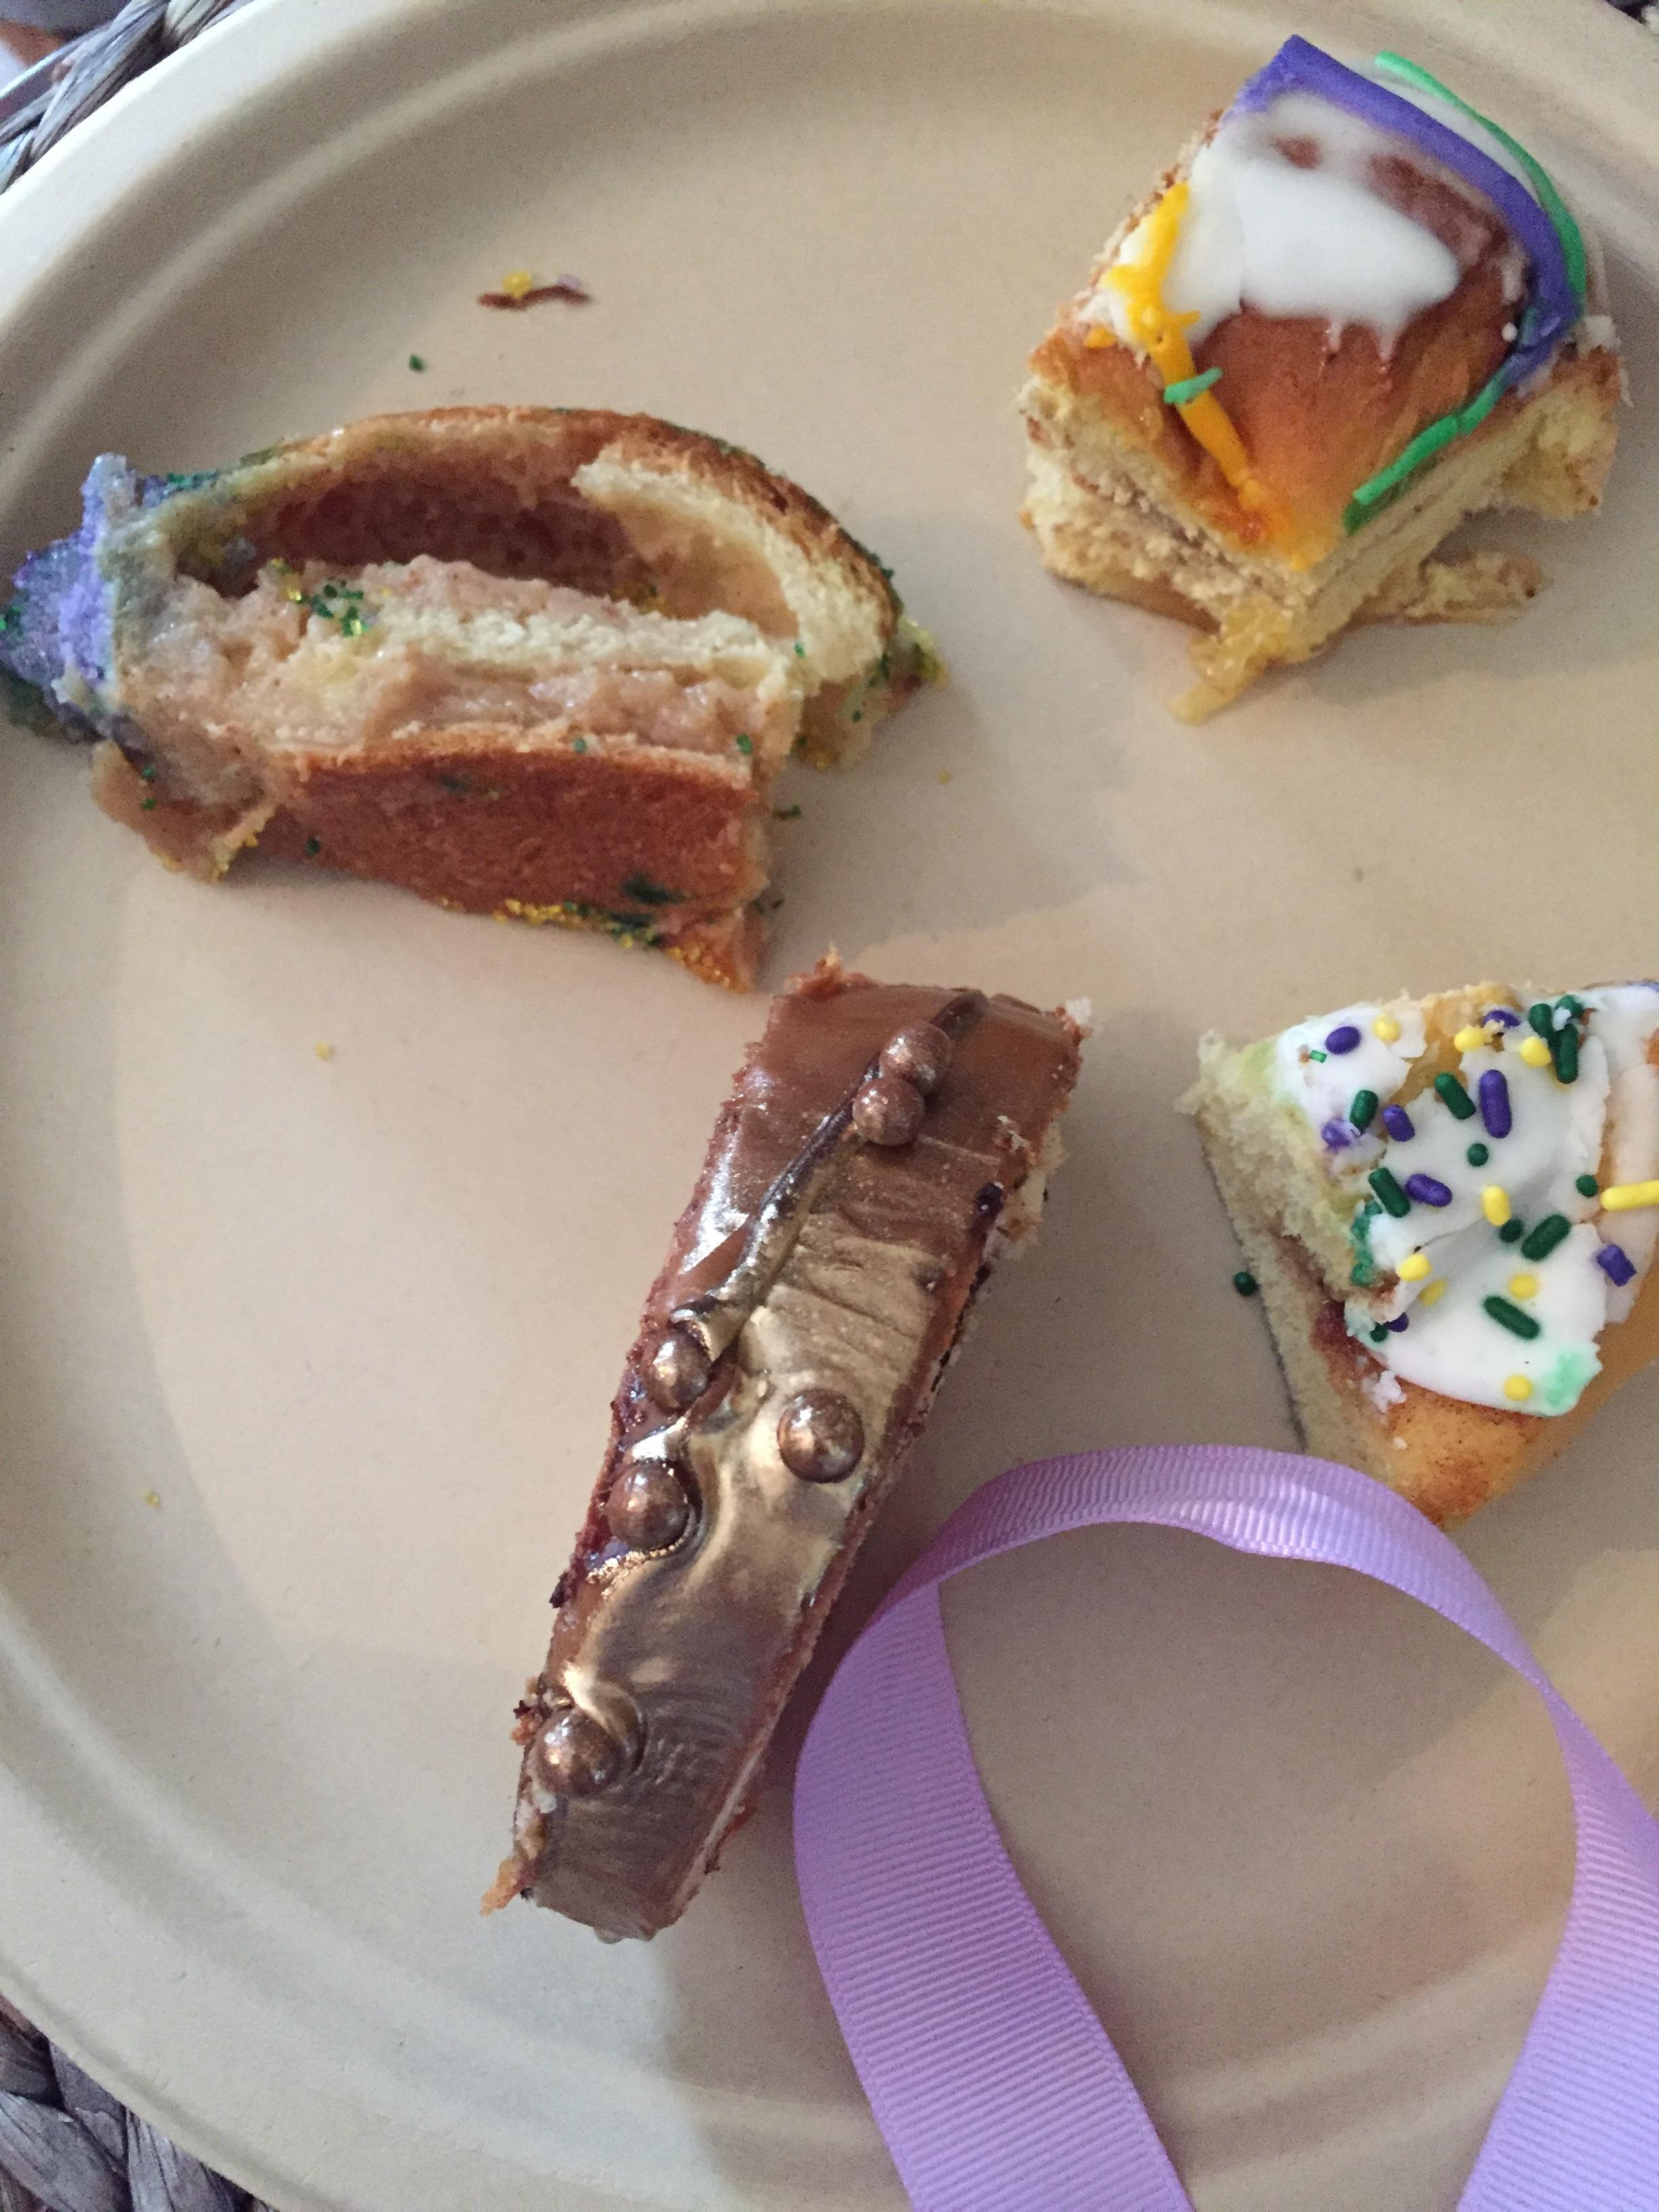 All diverse, all delicious!